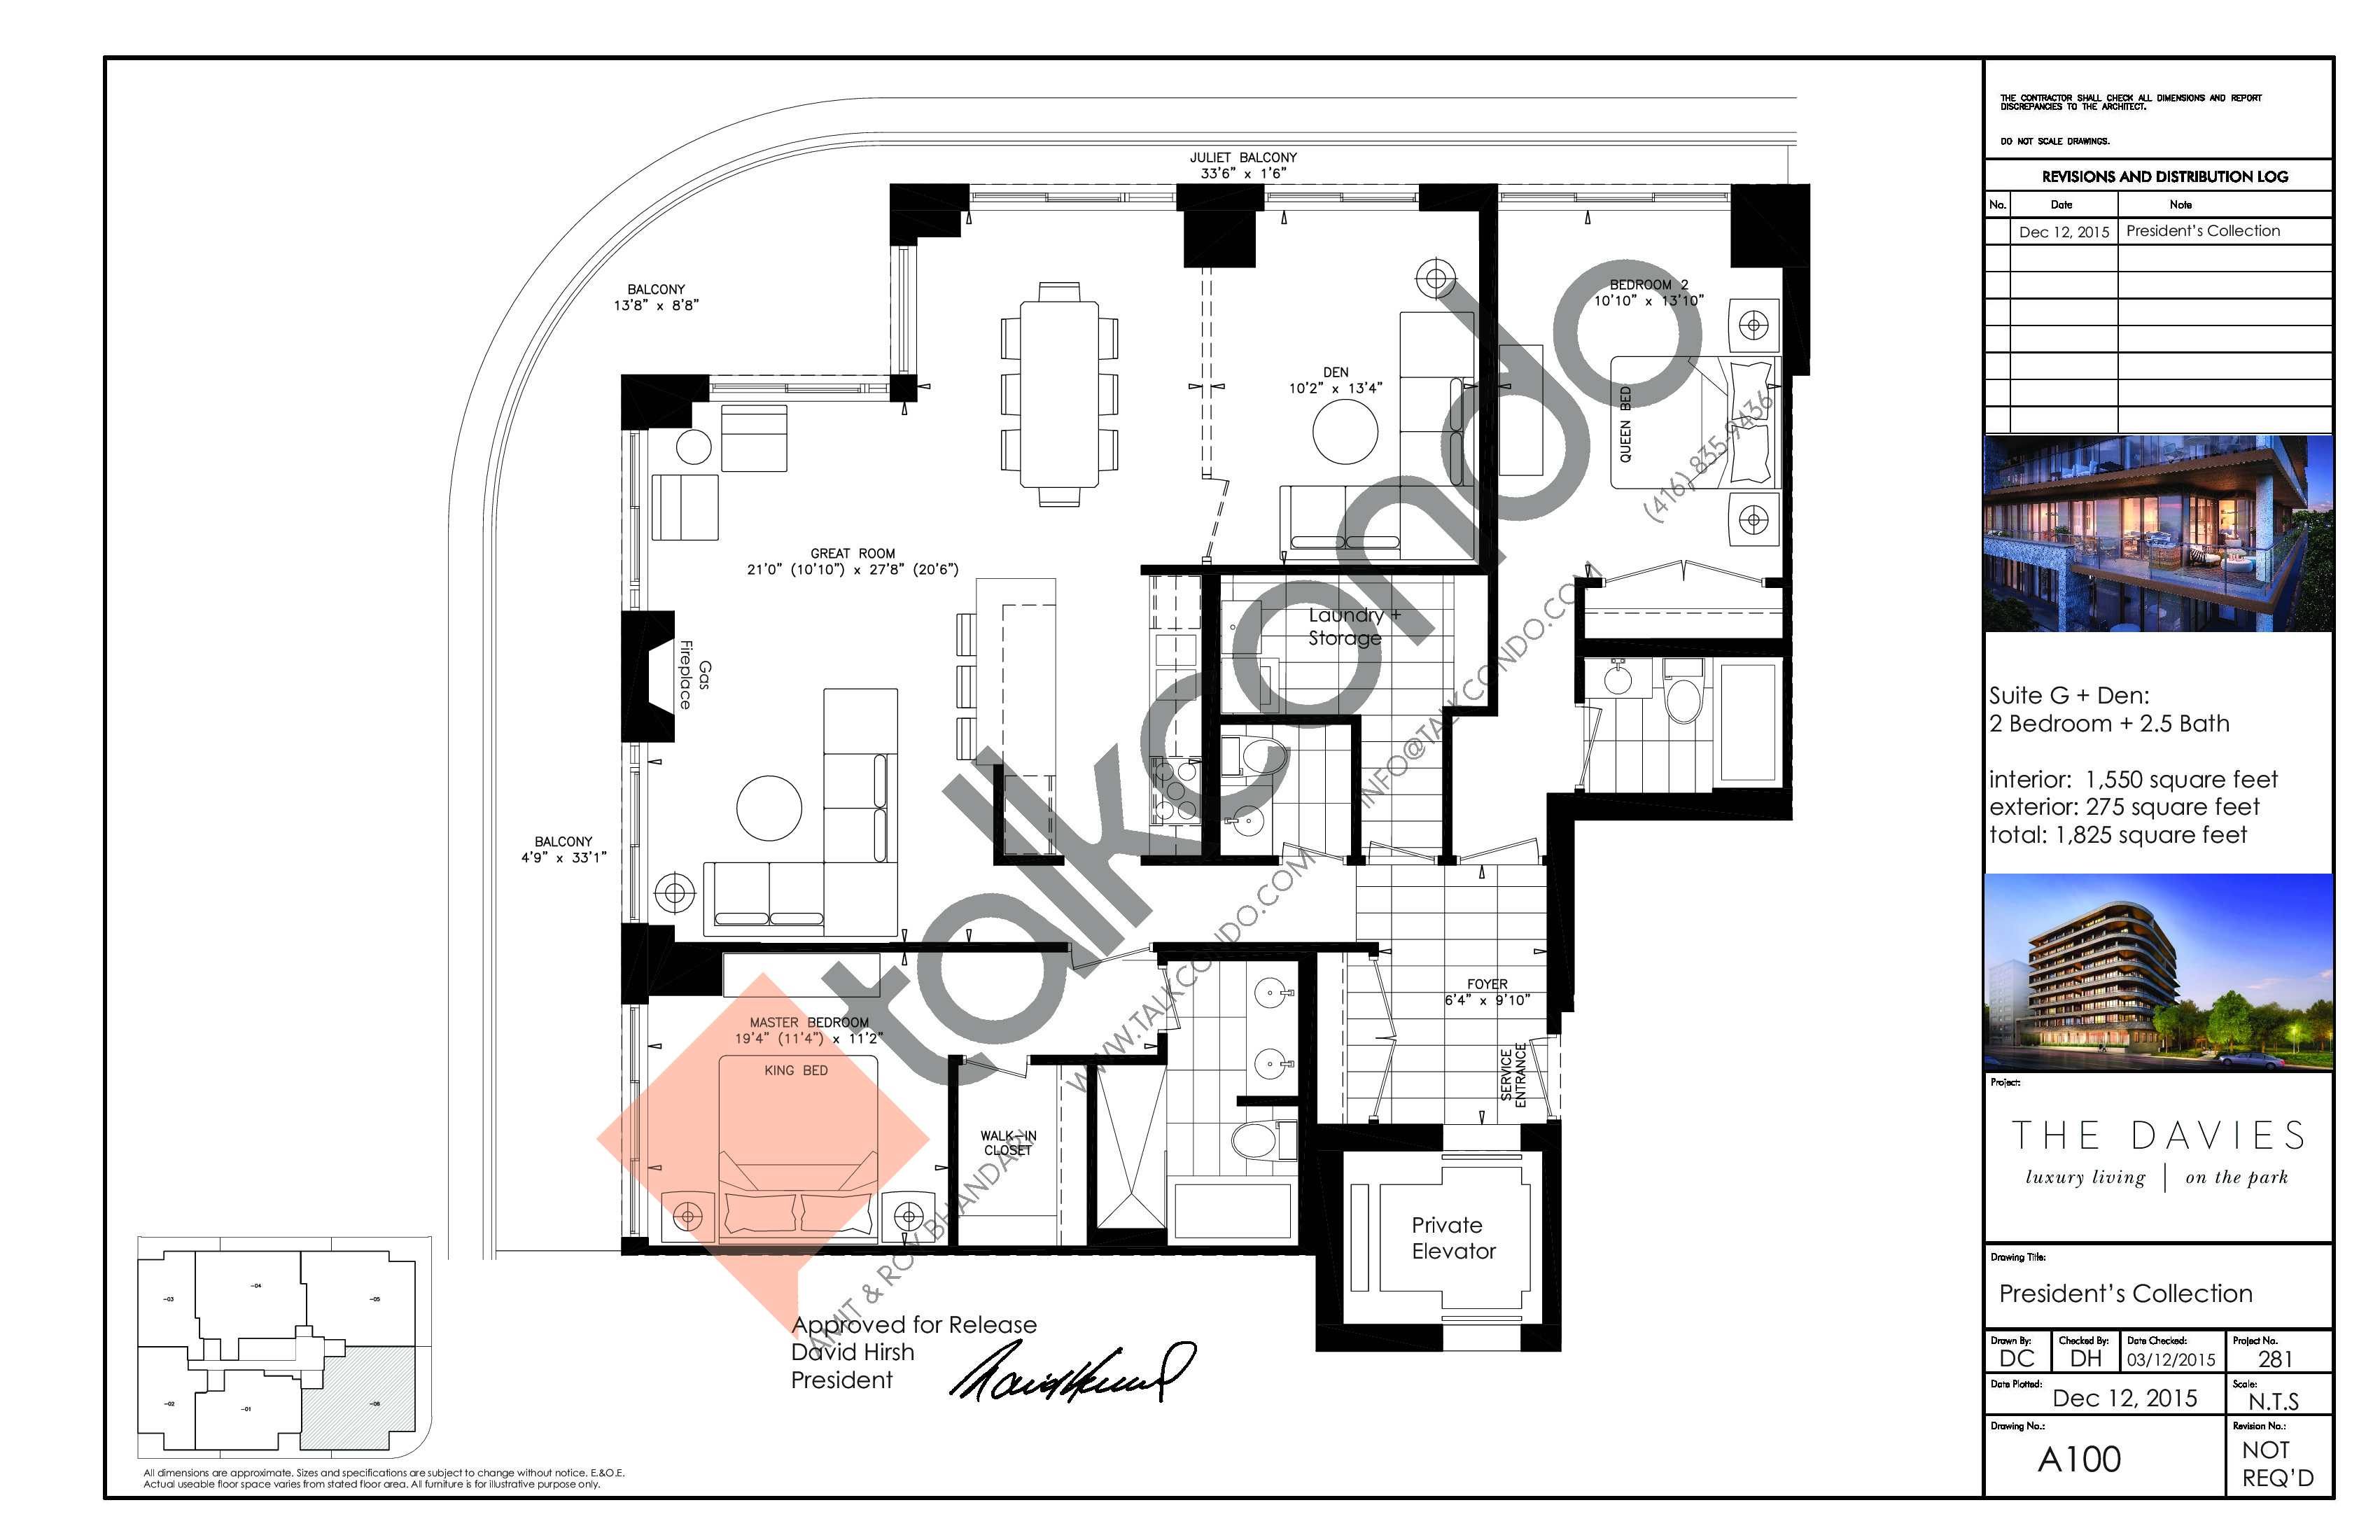 Suite G + Den Floor Plan at The Davies - 1550 sq.ft